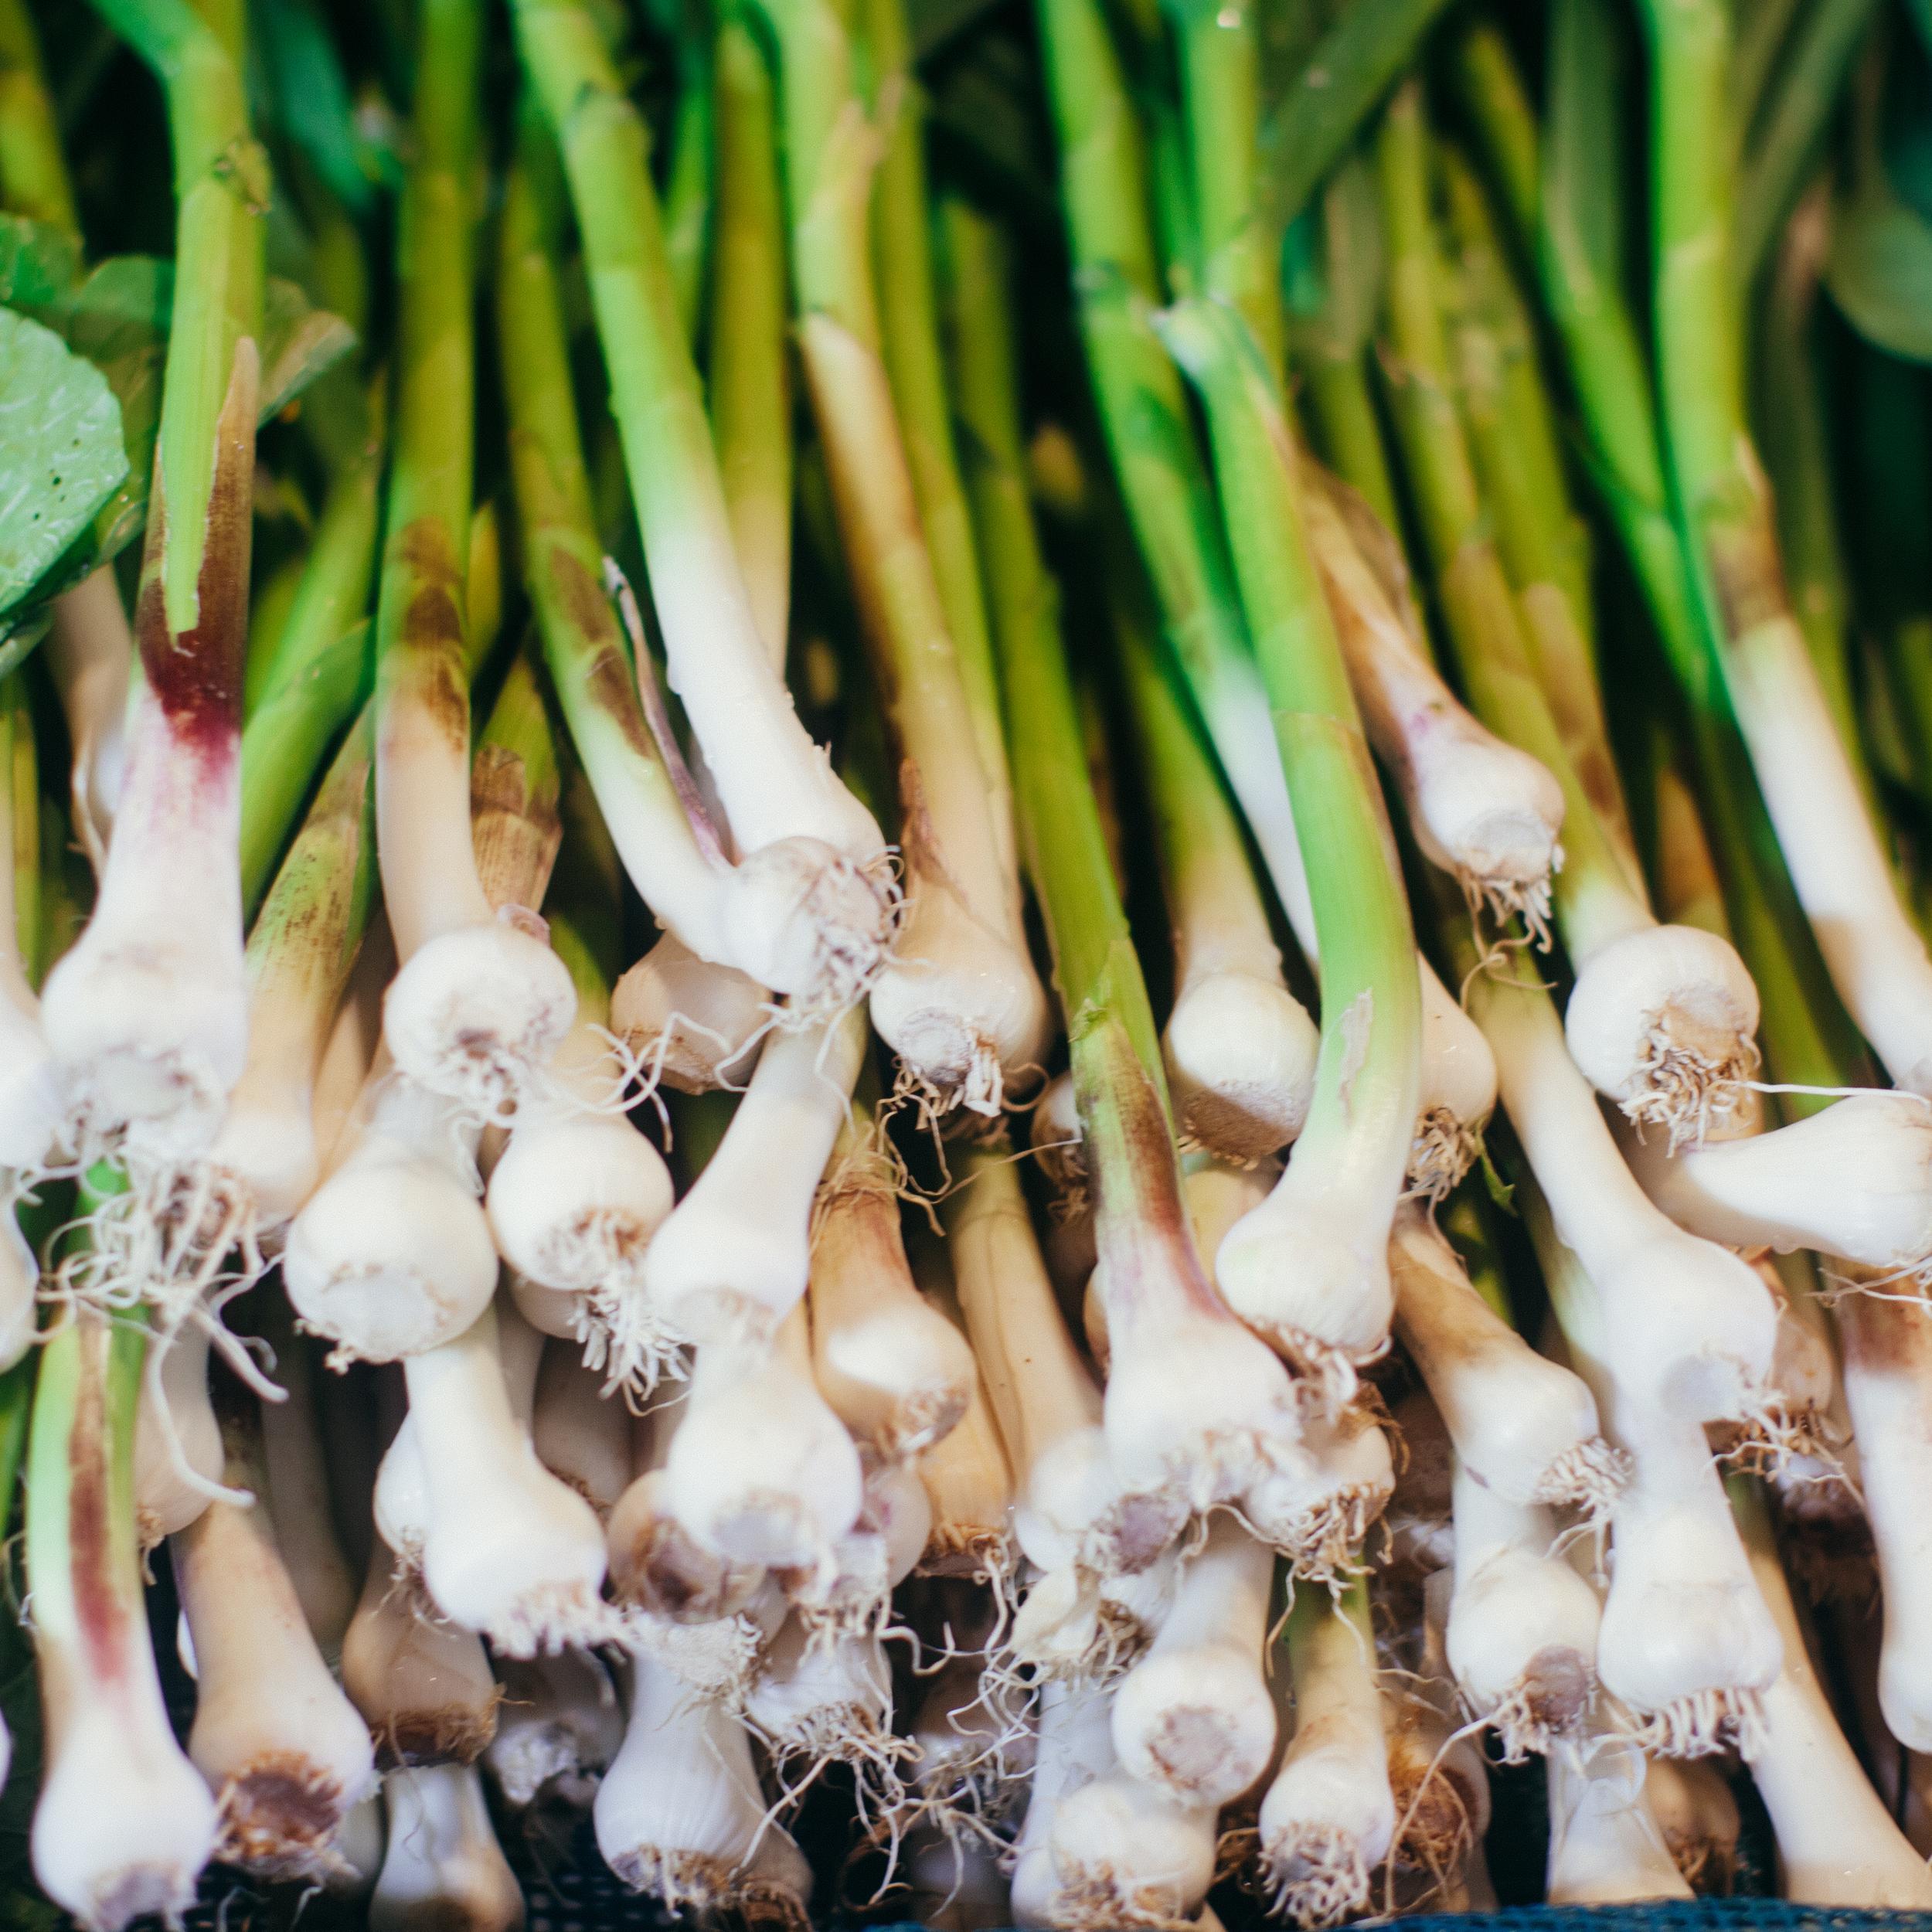 Green garlic from Beth's farm in Maine.